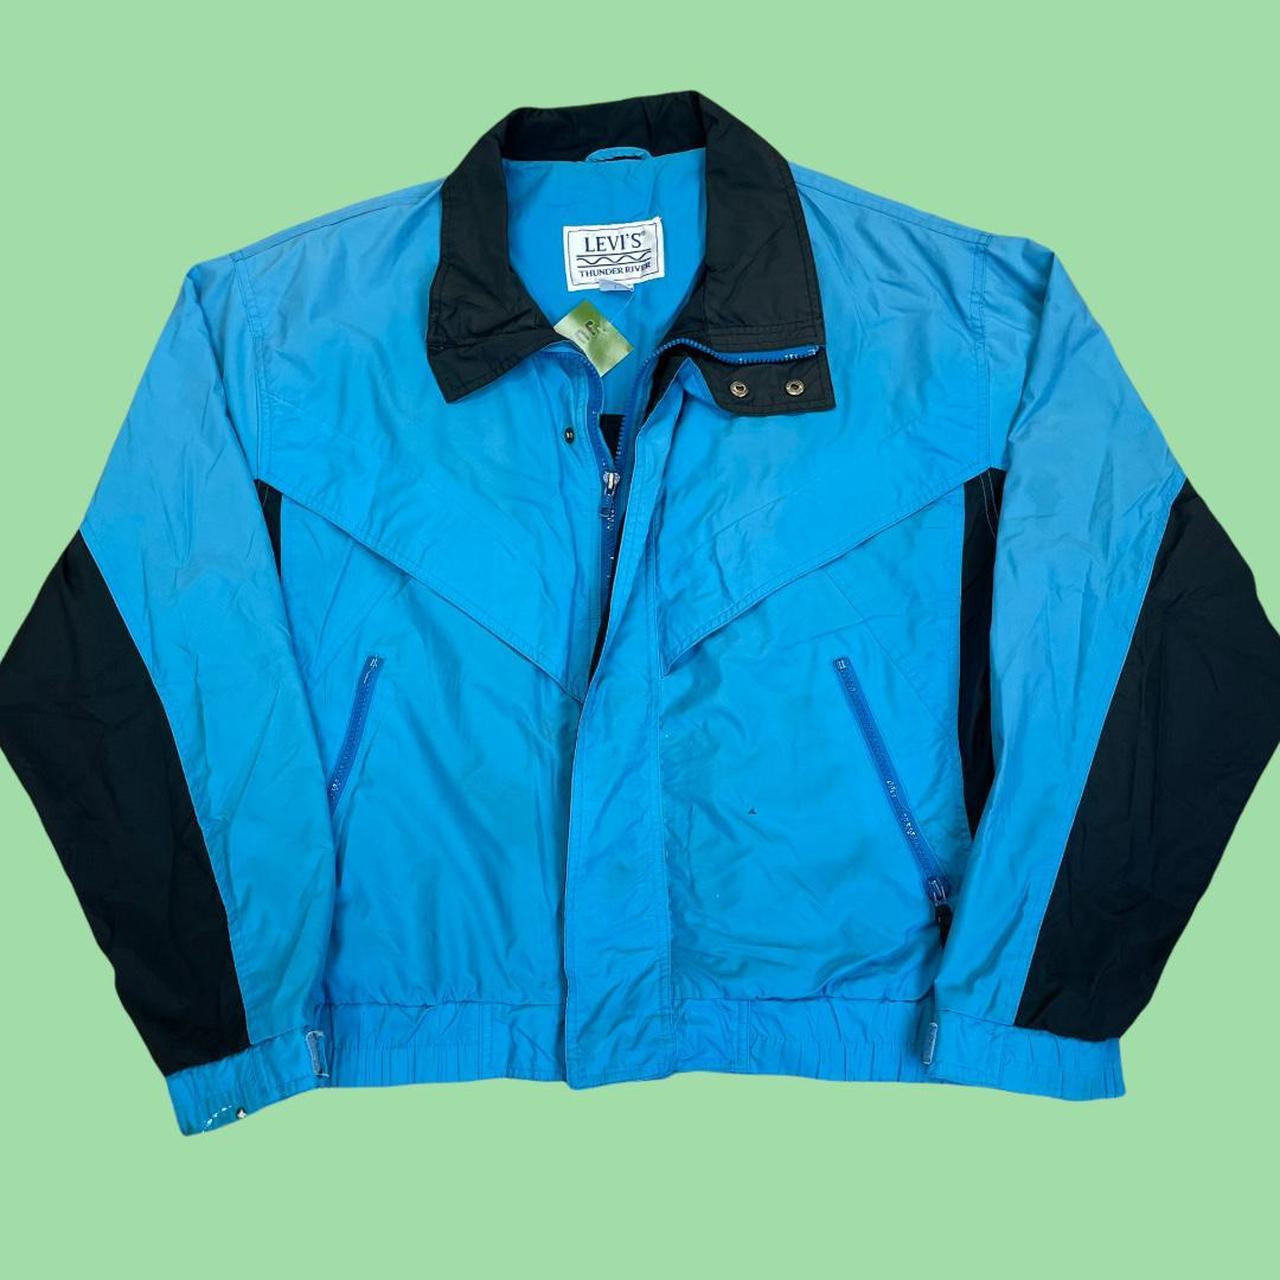 Product Image 1 - * vintage cyan blue color